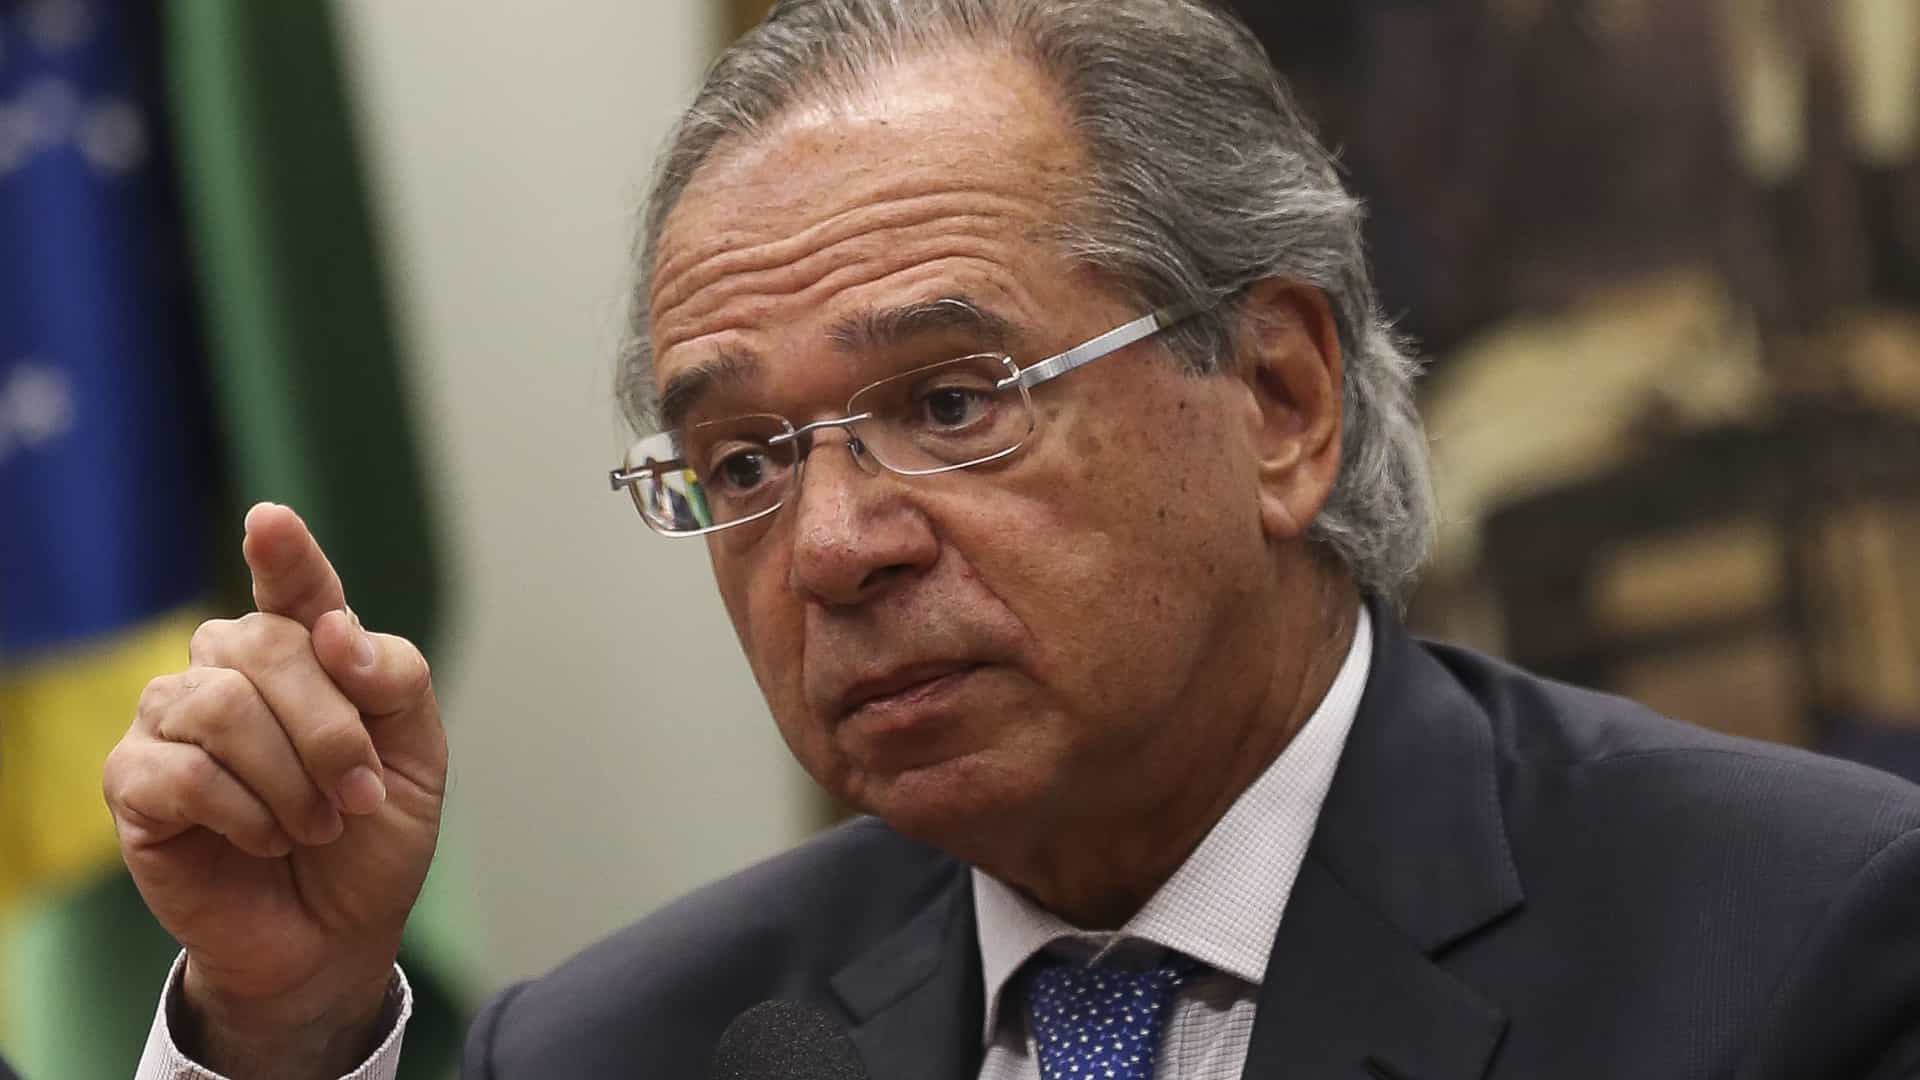 Após críticas, Guedes pede desculpa por fala sobre domésticas